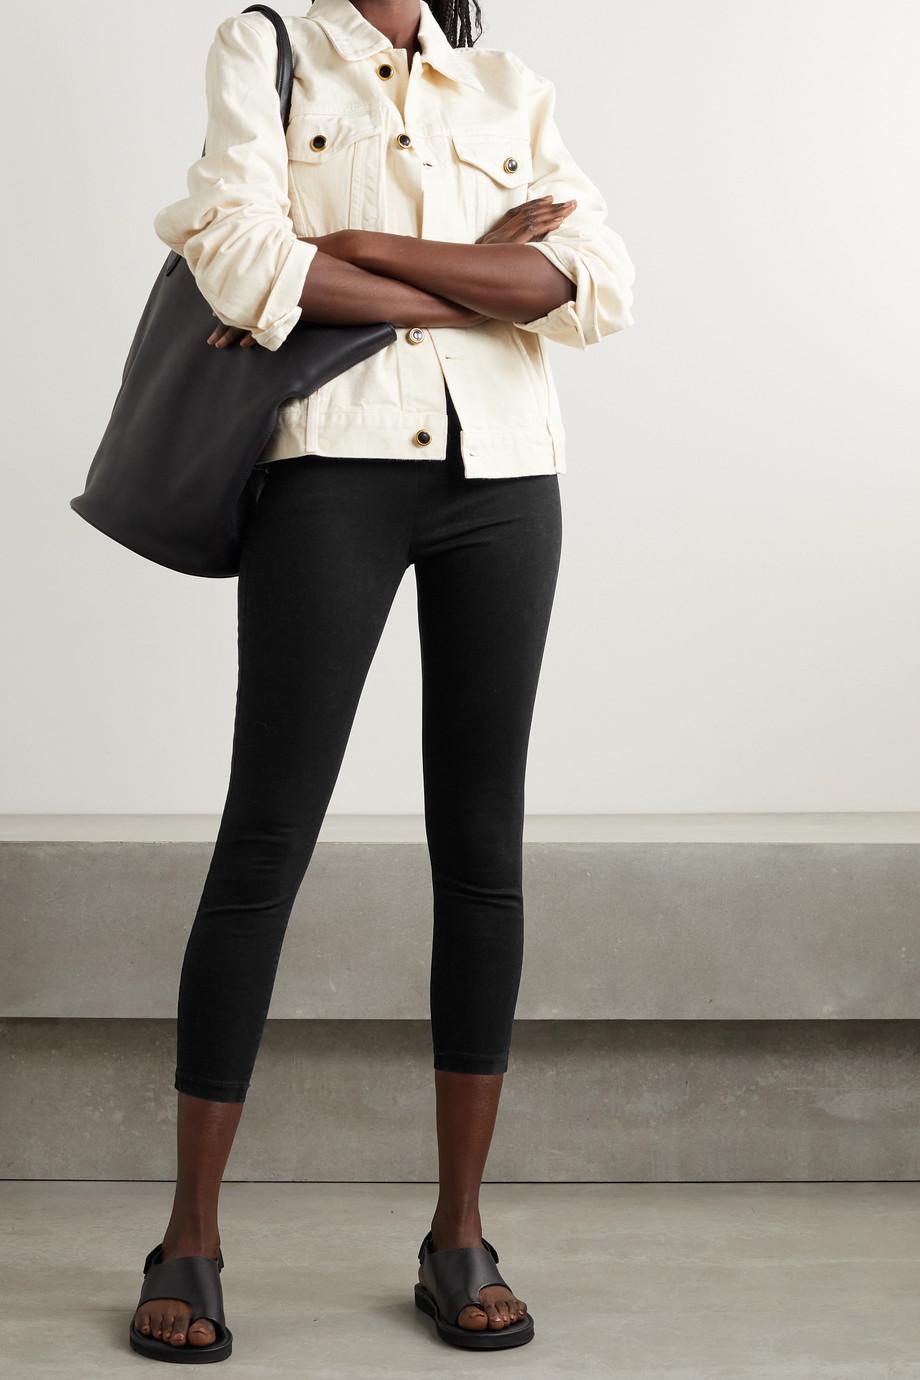 L'Agence Pantalon skinny raccourci en coton et modal mélangés stretch Rosalie